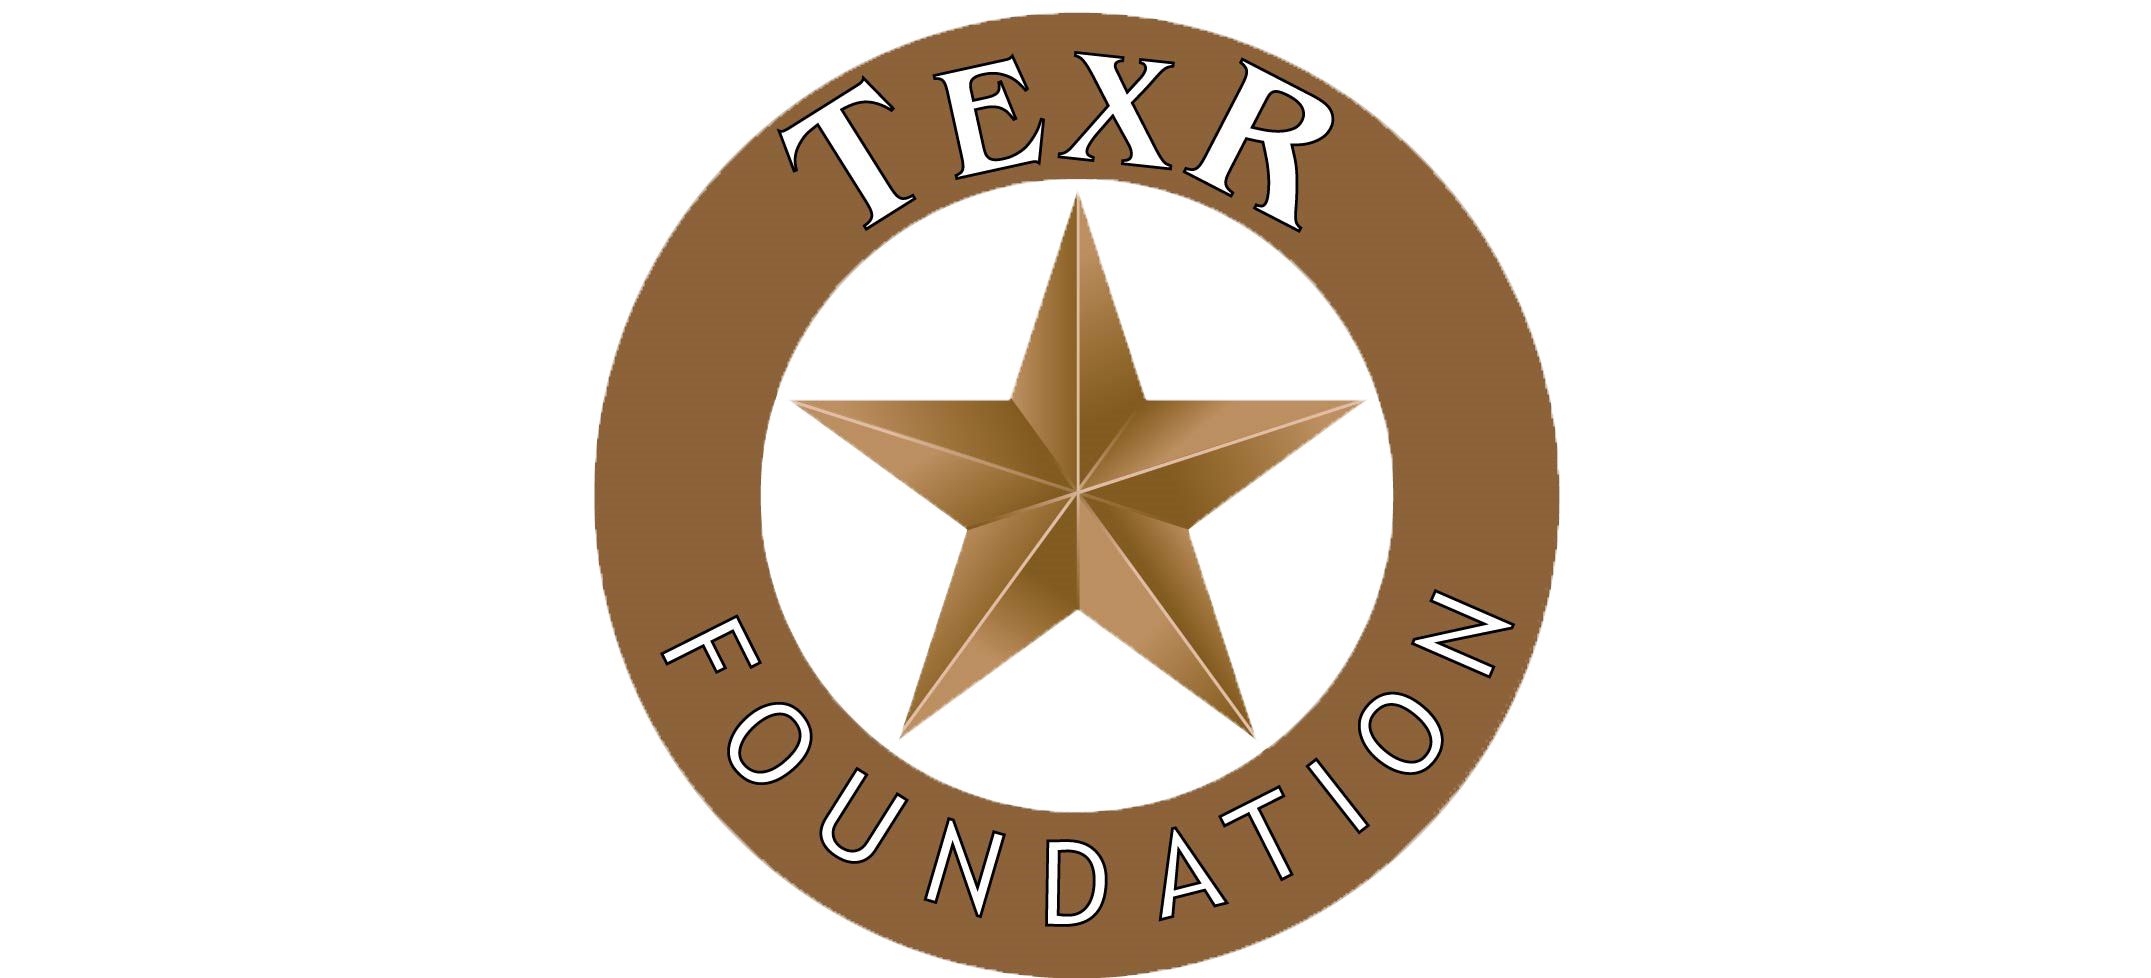 TEXR Foundation 9th Annual Charity Golf Tournament logo